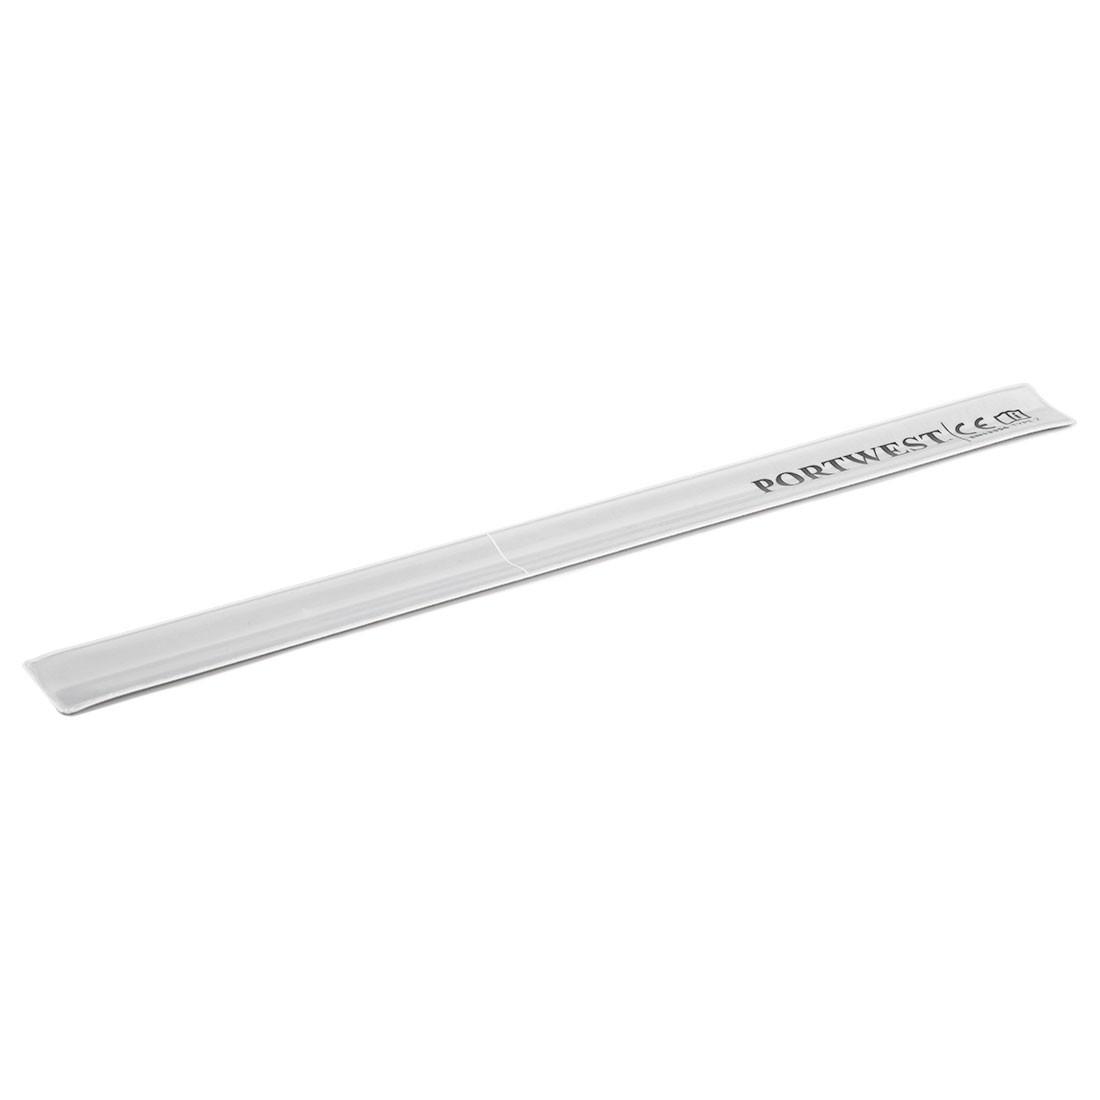 Reflecterende Arm Wrap Band 38 x 3 cm